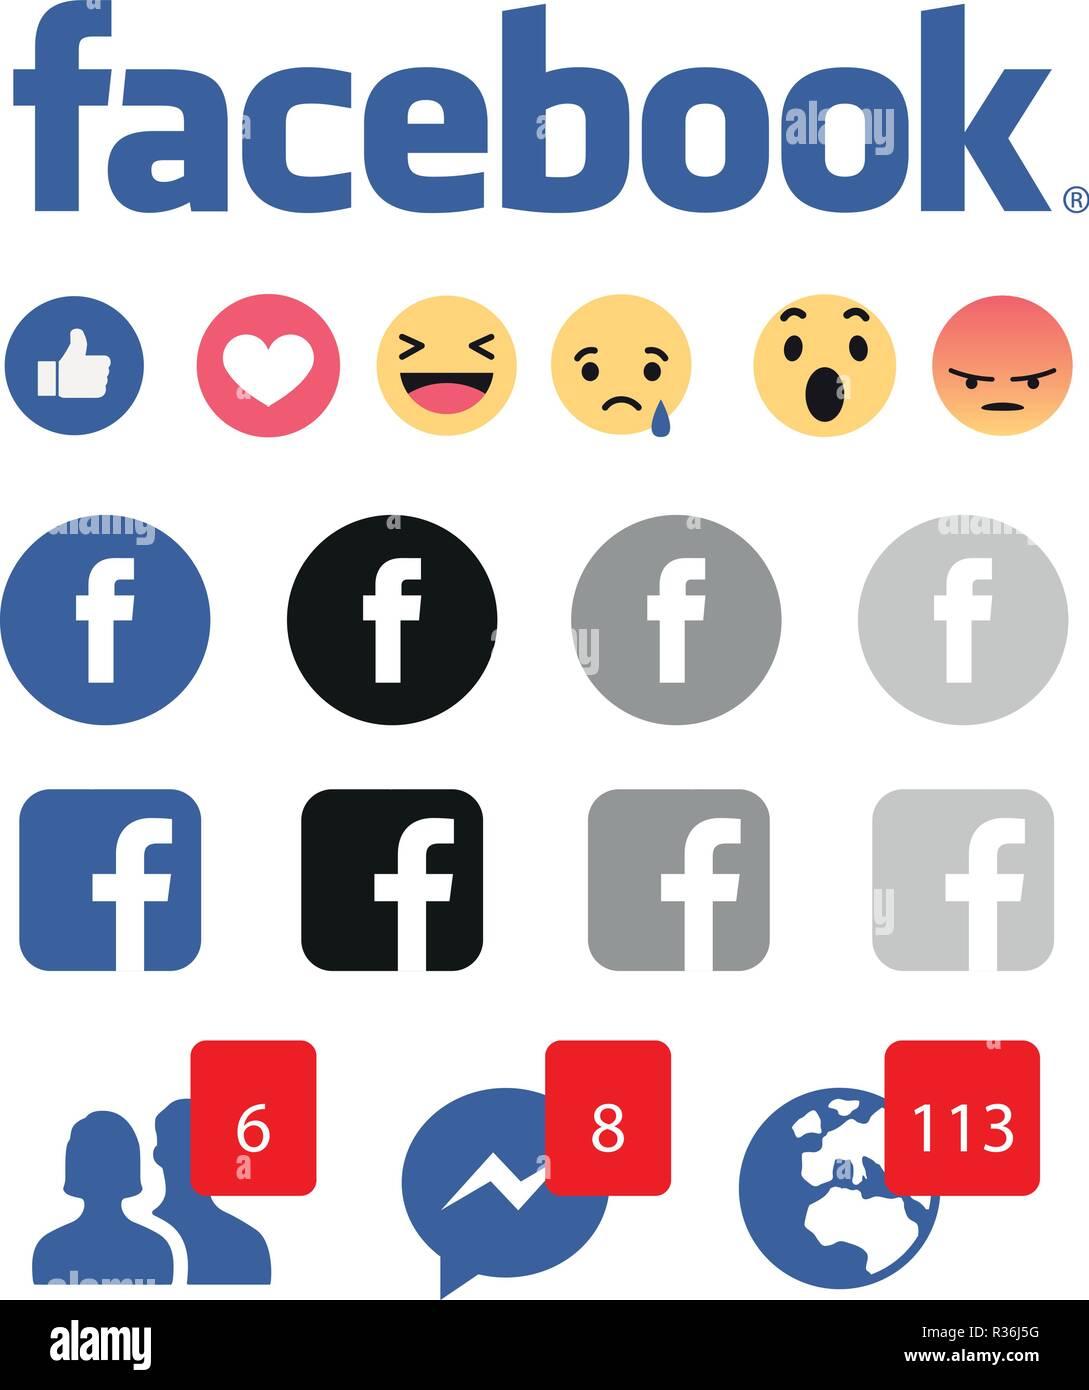 Twitter Facebook Instagram Icons : twitter, facebook, instagram, icons, Social, Media, Icons, Vector, Illustrator, Social,, Media,, Icon,, Snapchat,, Facebook,, Instagram,, Twitter,, Whatsapp,, Network,, Popular,, Comm,, Stock, Image, Alamy